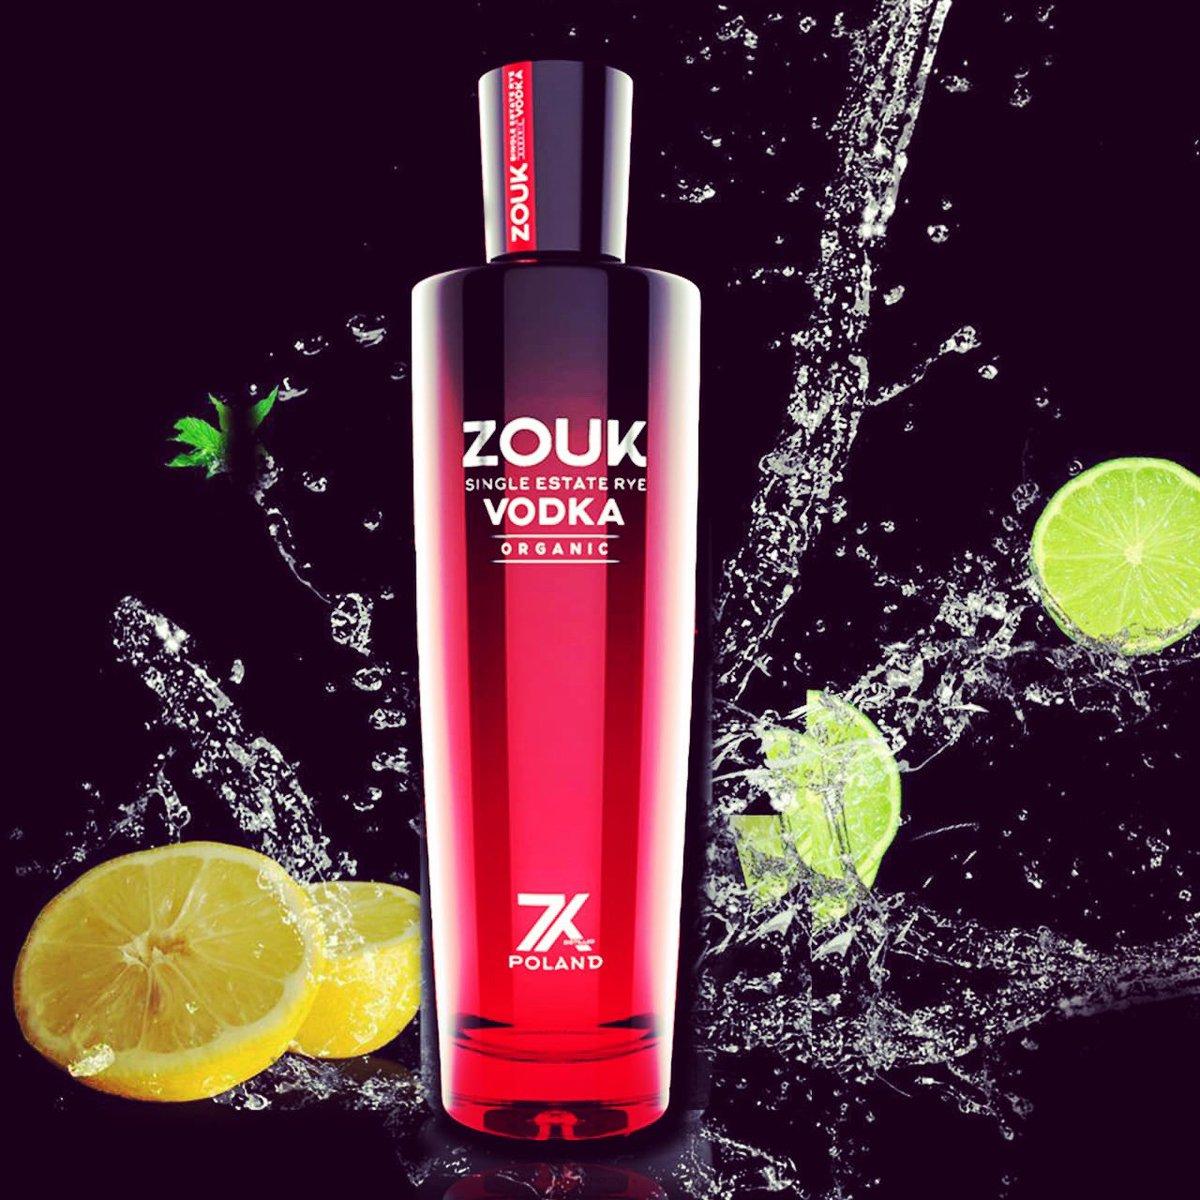 Thursdays are always better When you have Zouk Vodka   #zoukvodka #vodka #thursdayvibes #chillmode✌🏻️